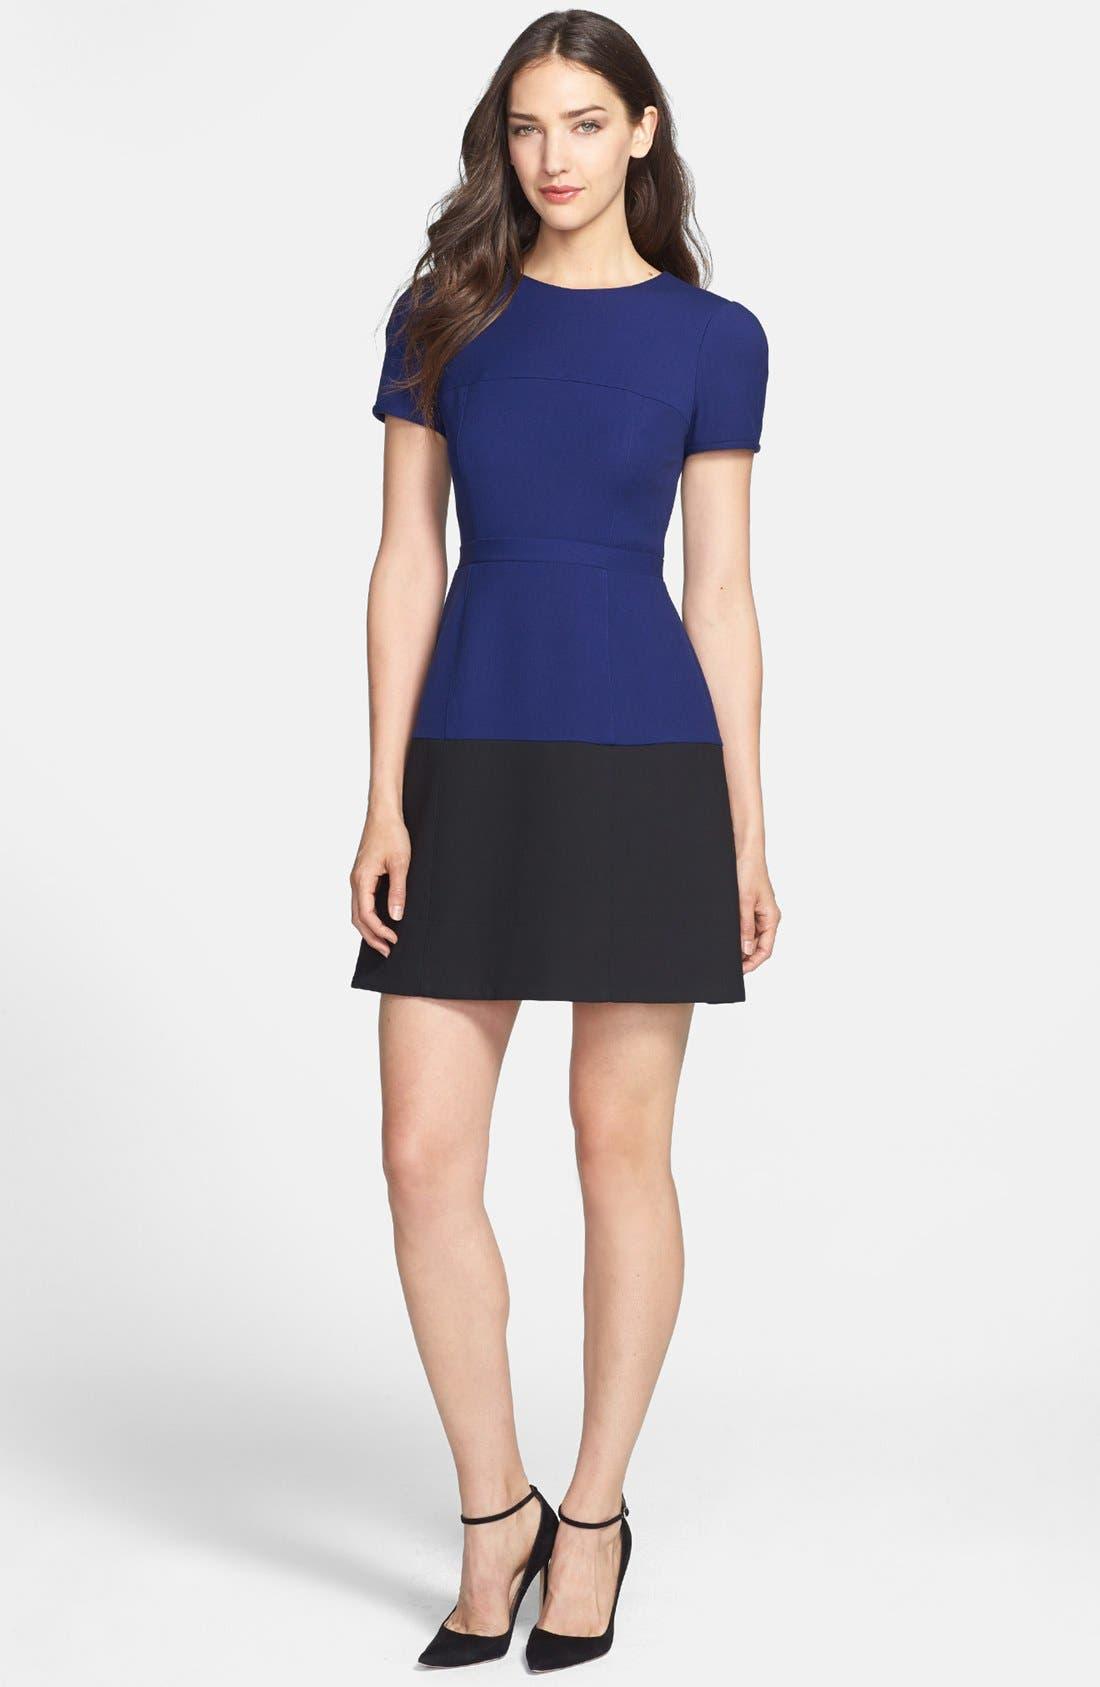 Alternate Image 1 Selected - BCBGMAXAZRIA 'Hannah' Colorblock Fit & Flare Dress